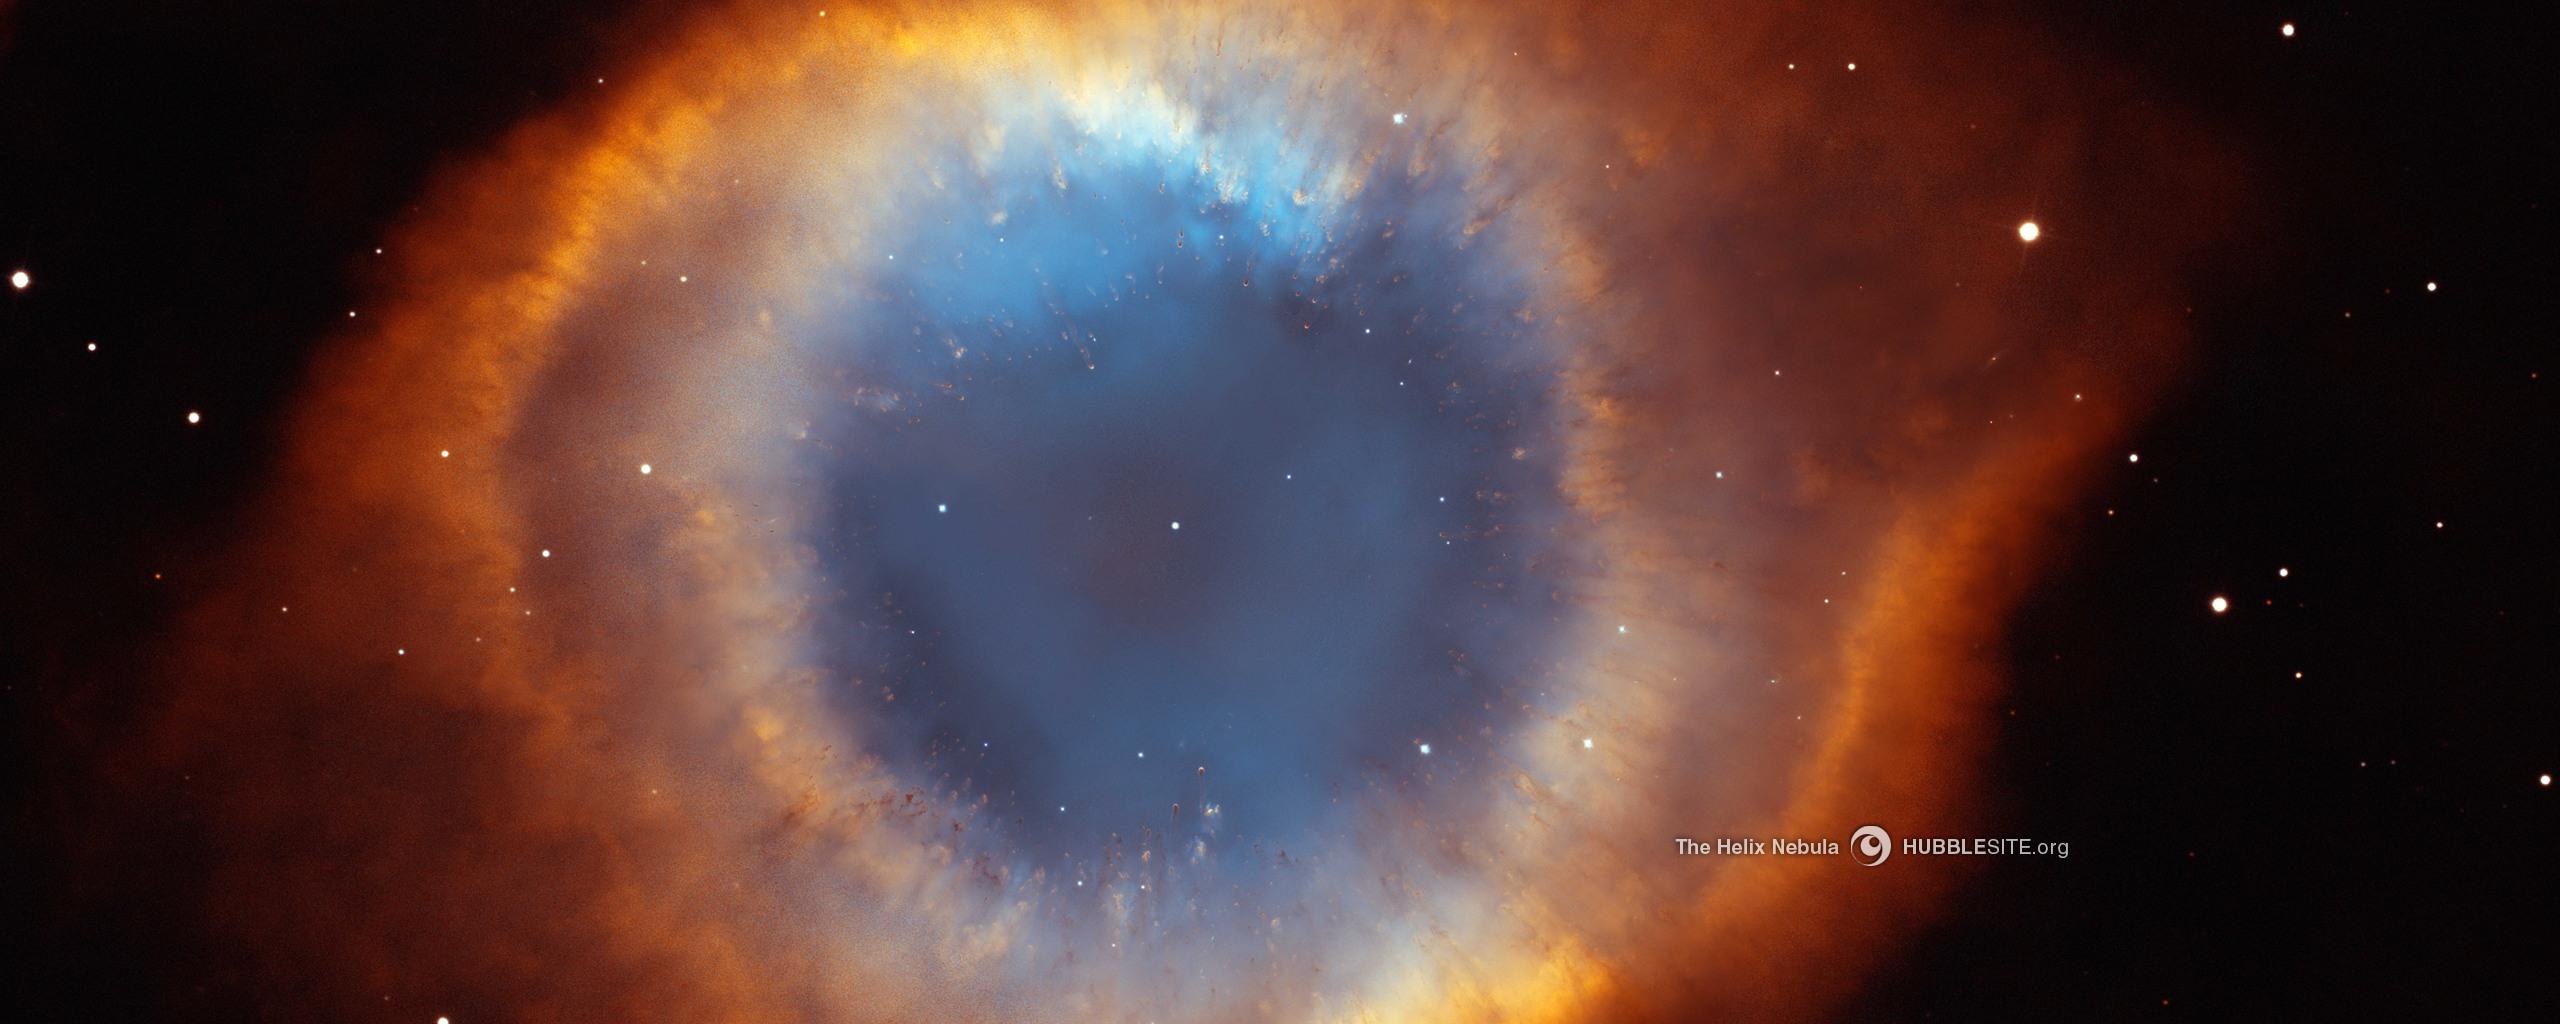 Free Download Nasa Eye Of God Nebula Hd Walls Find Wallpapers